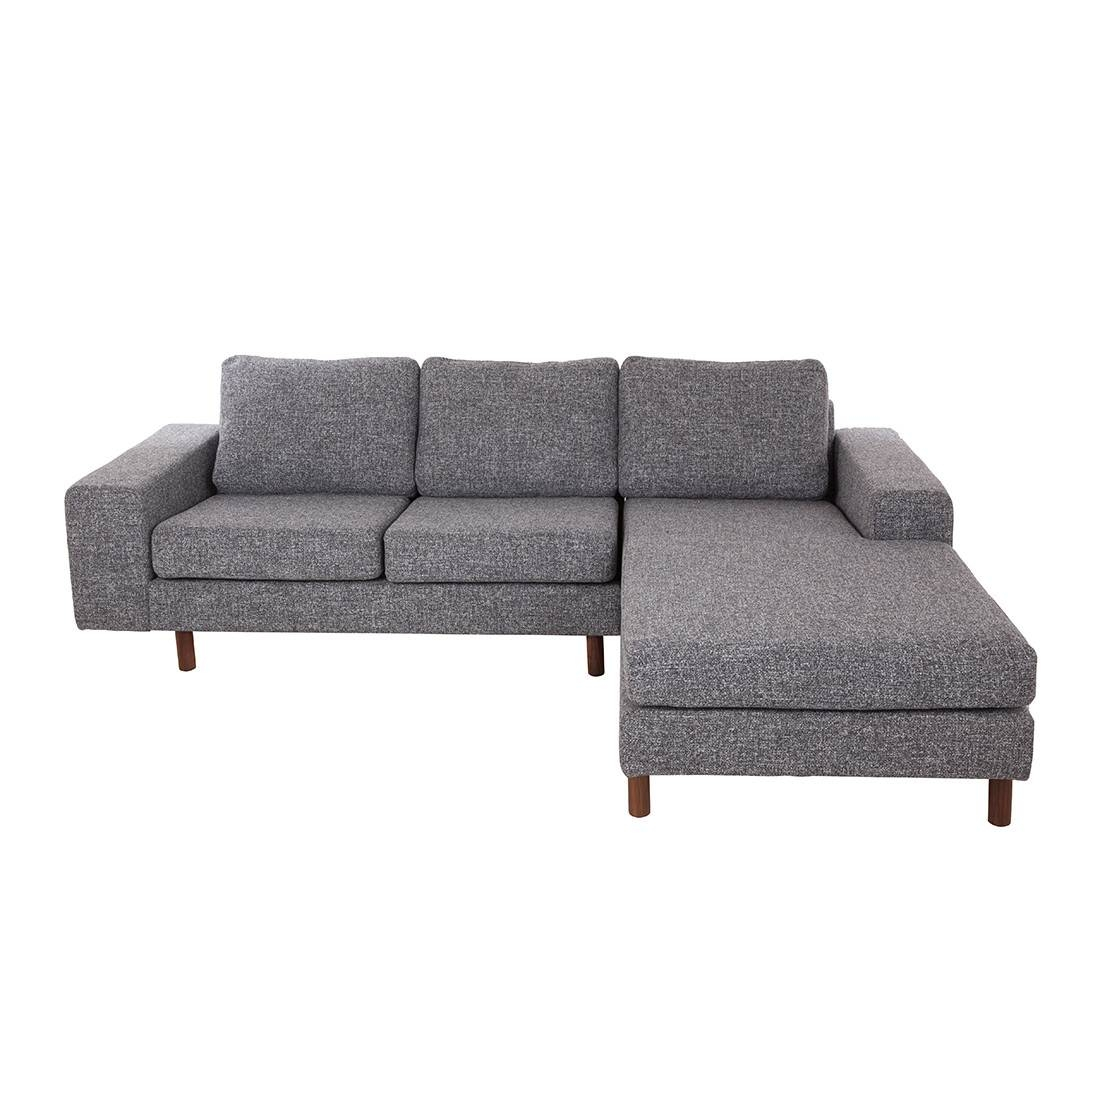 Sofas: Mid Century Settee | Mid Century Sofas | Cheap Mid Century Inside Cheap Retro Sofas (View 16 of 30)